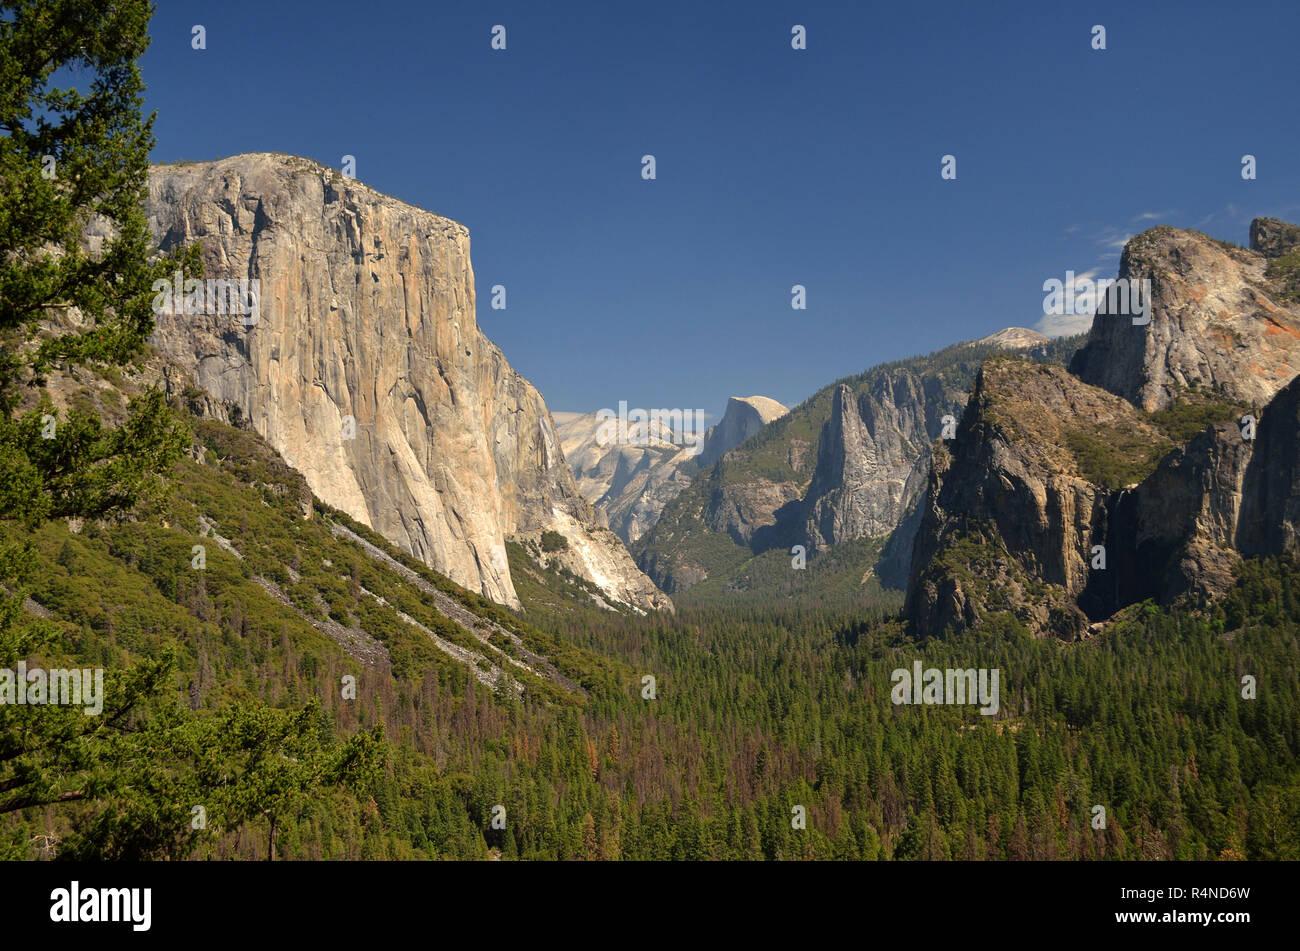 El Capitan and the Yosemite Valley, California, USA Stock Photo